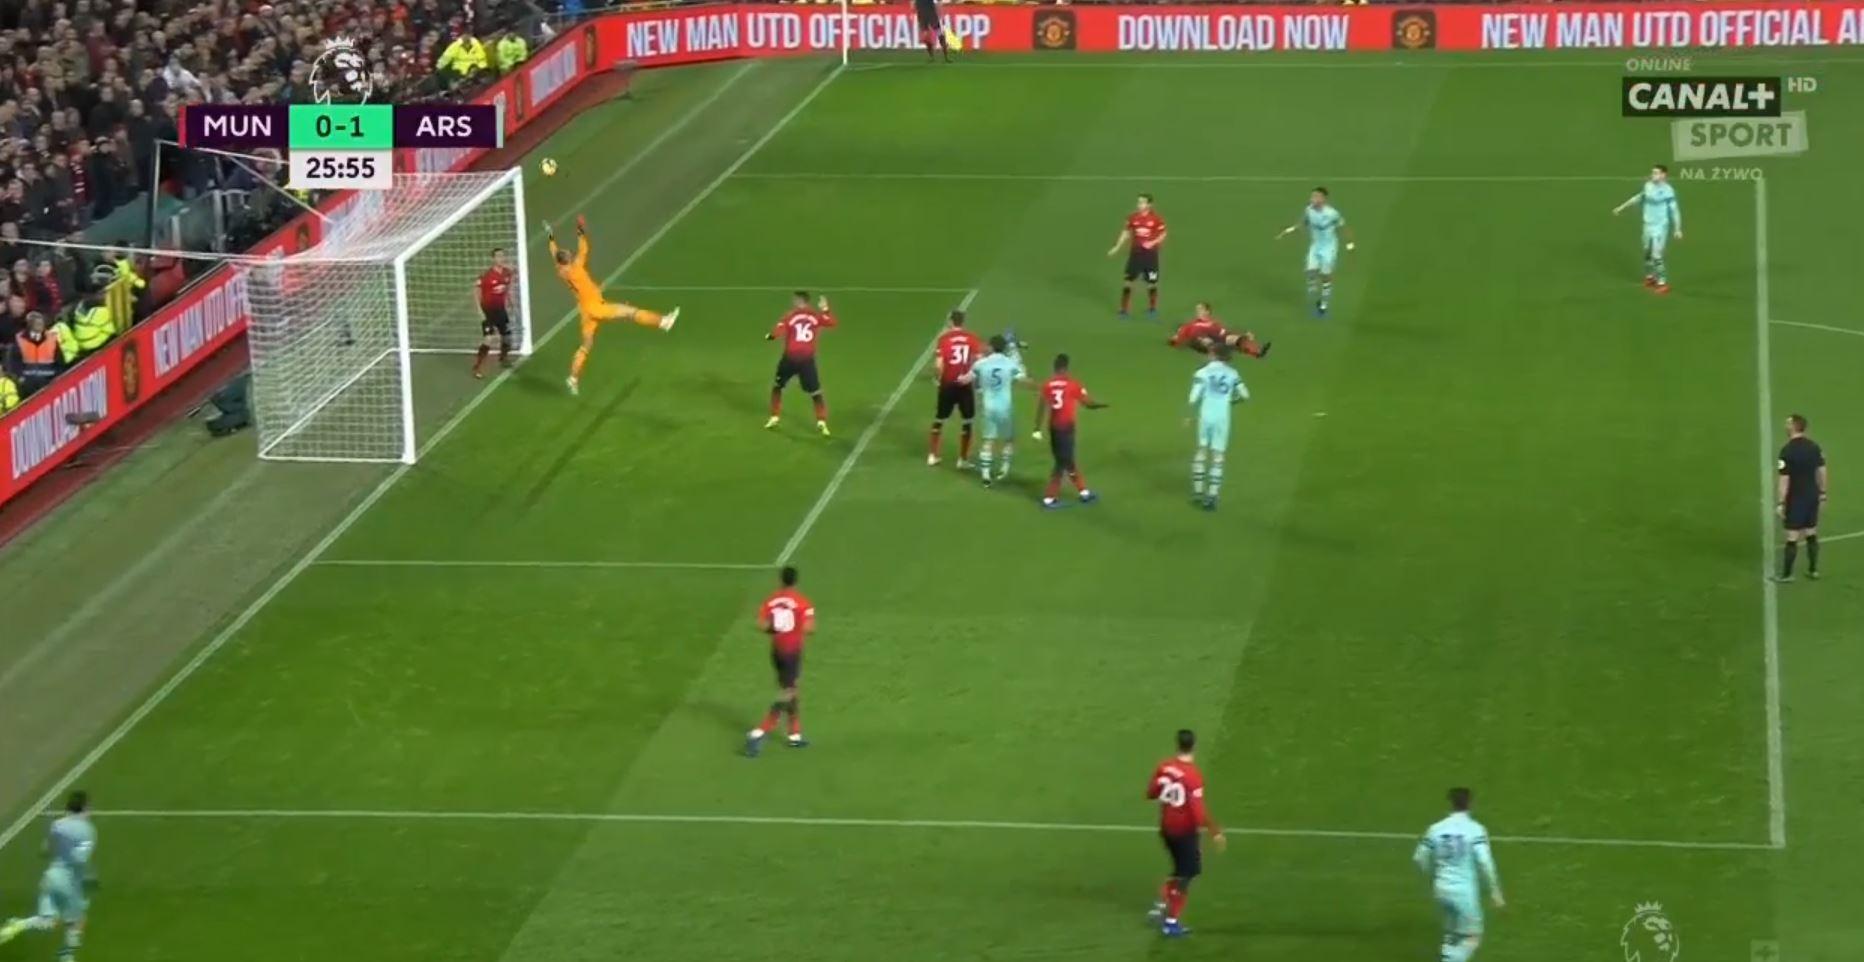 WATCH: De Gea Spills The Ball Over The Line For Arsenal Goal!